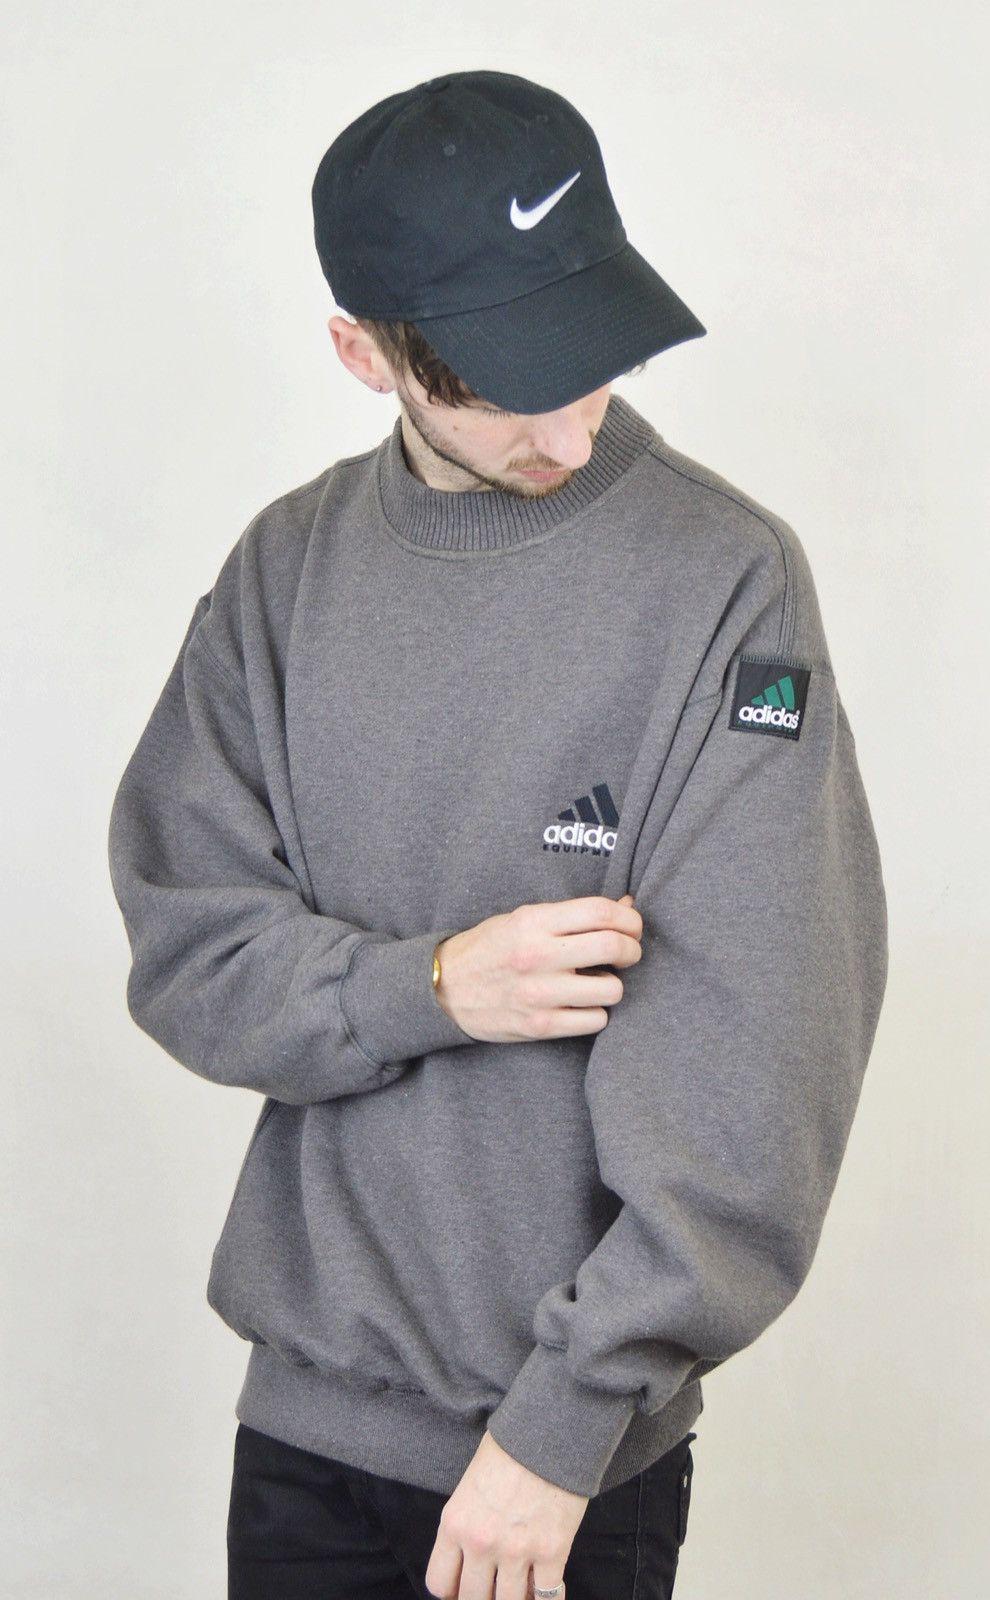 90s Vintage Adidas Equipment Sweatshirt M